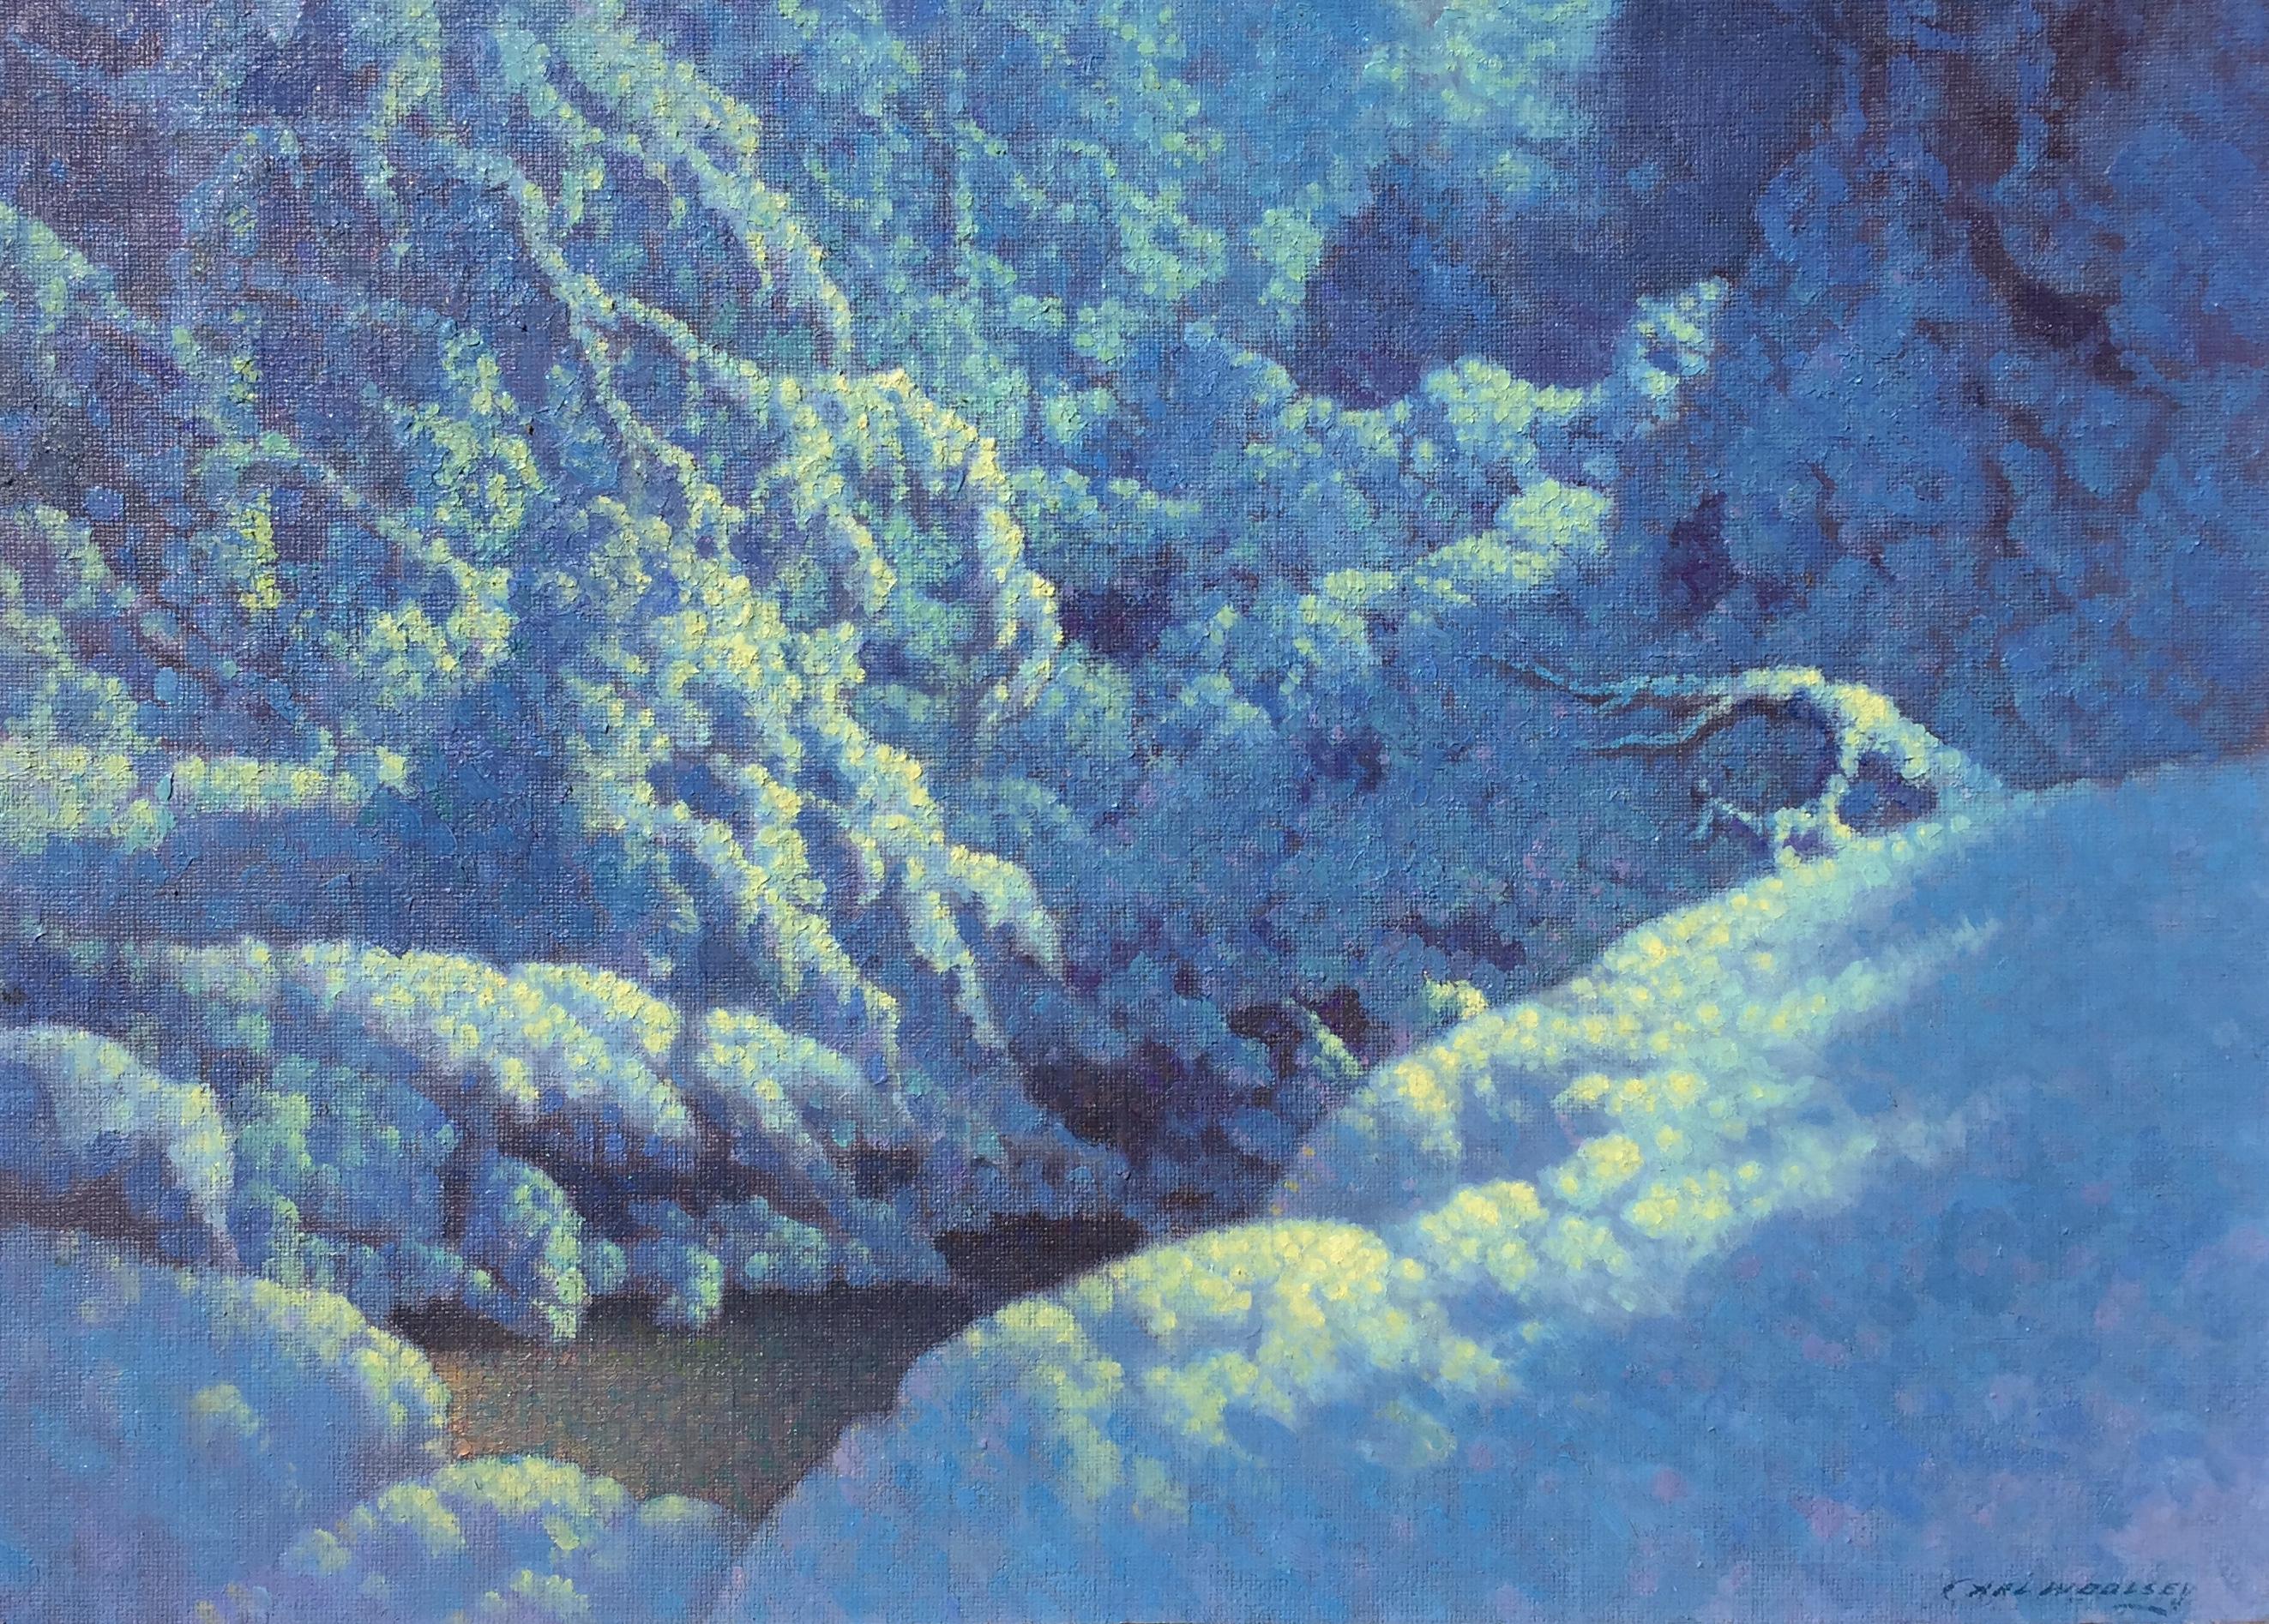 Snowclad